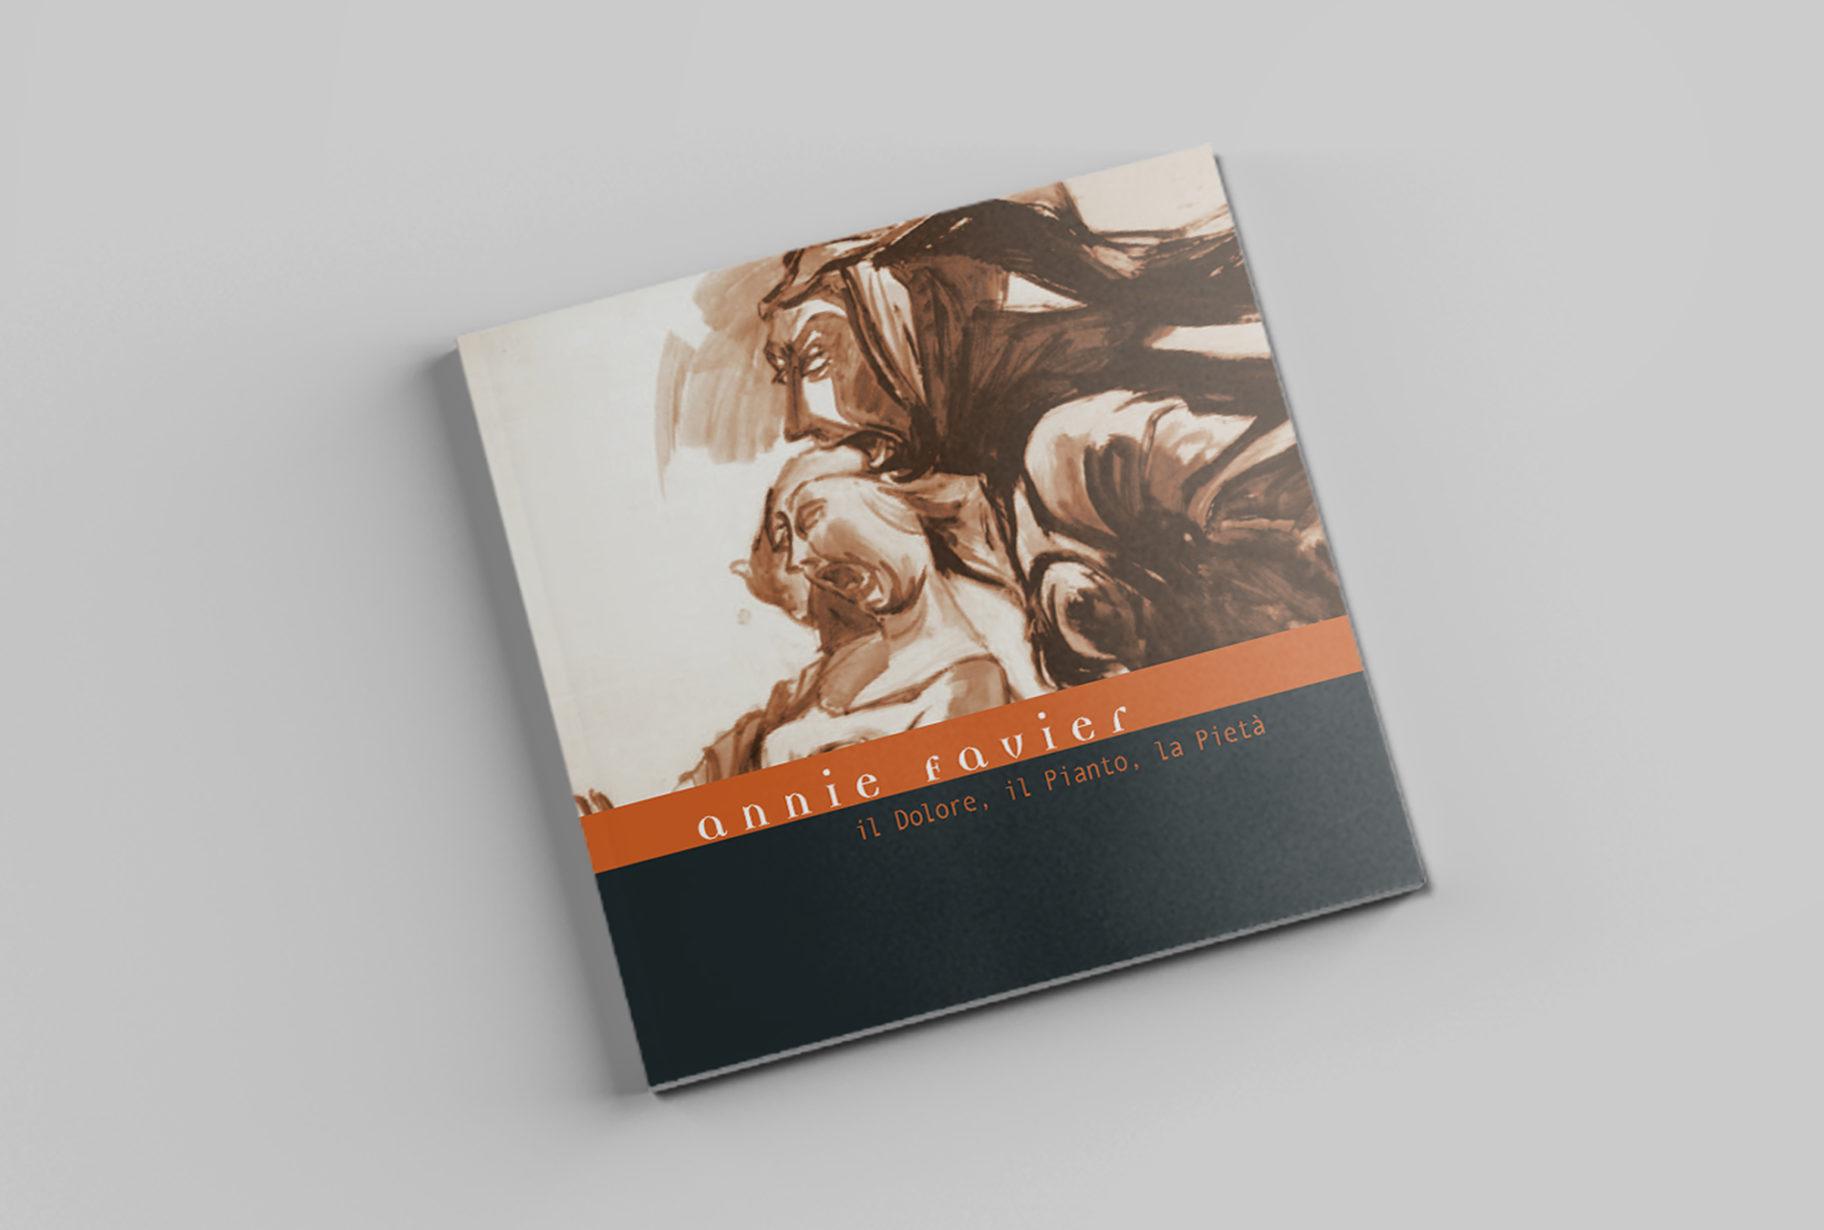 cenobio-annie-favier-brochure-01